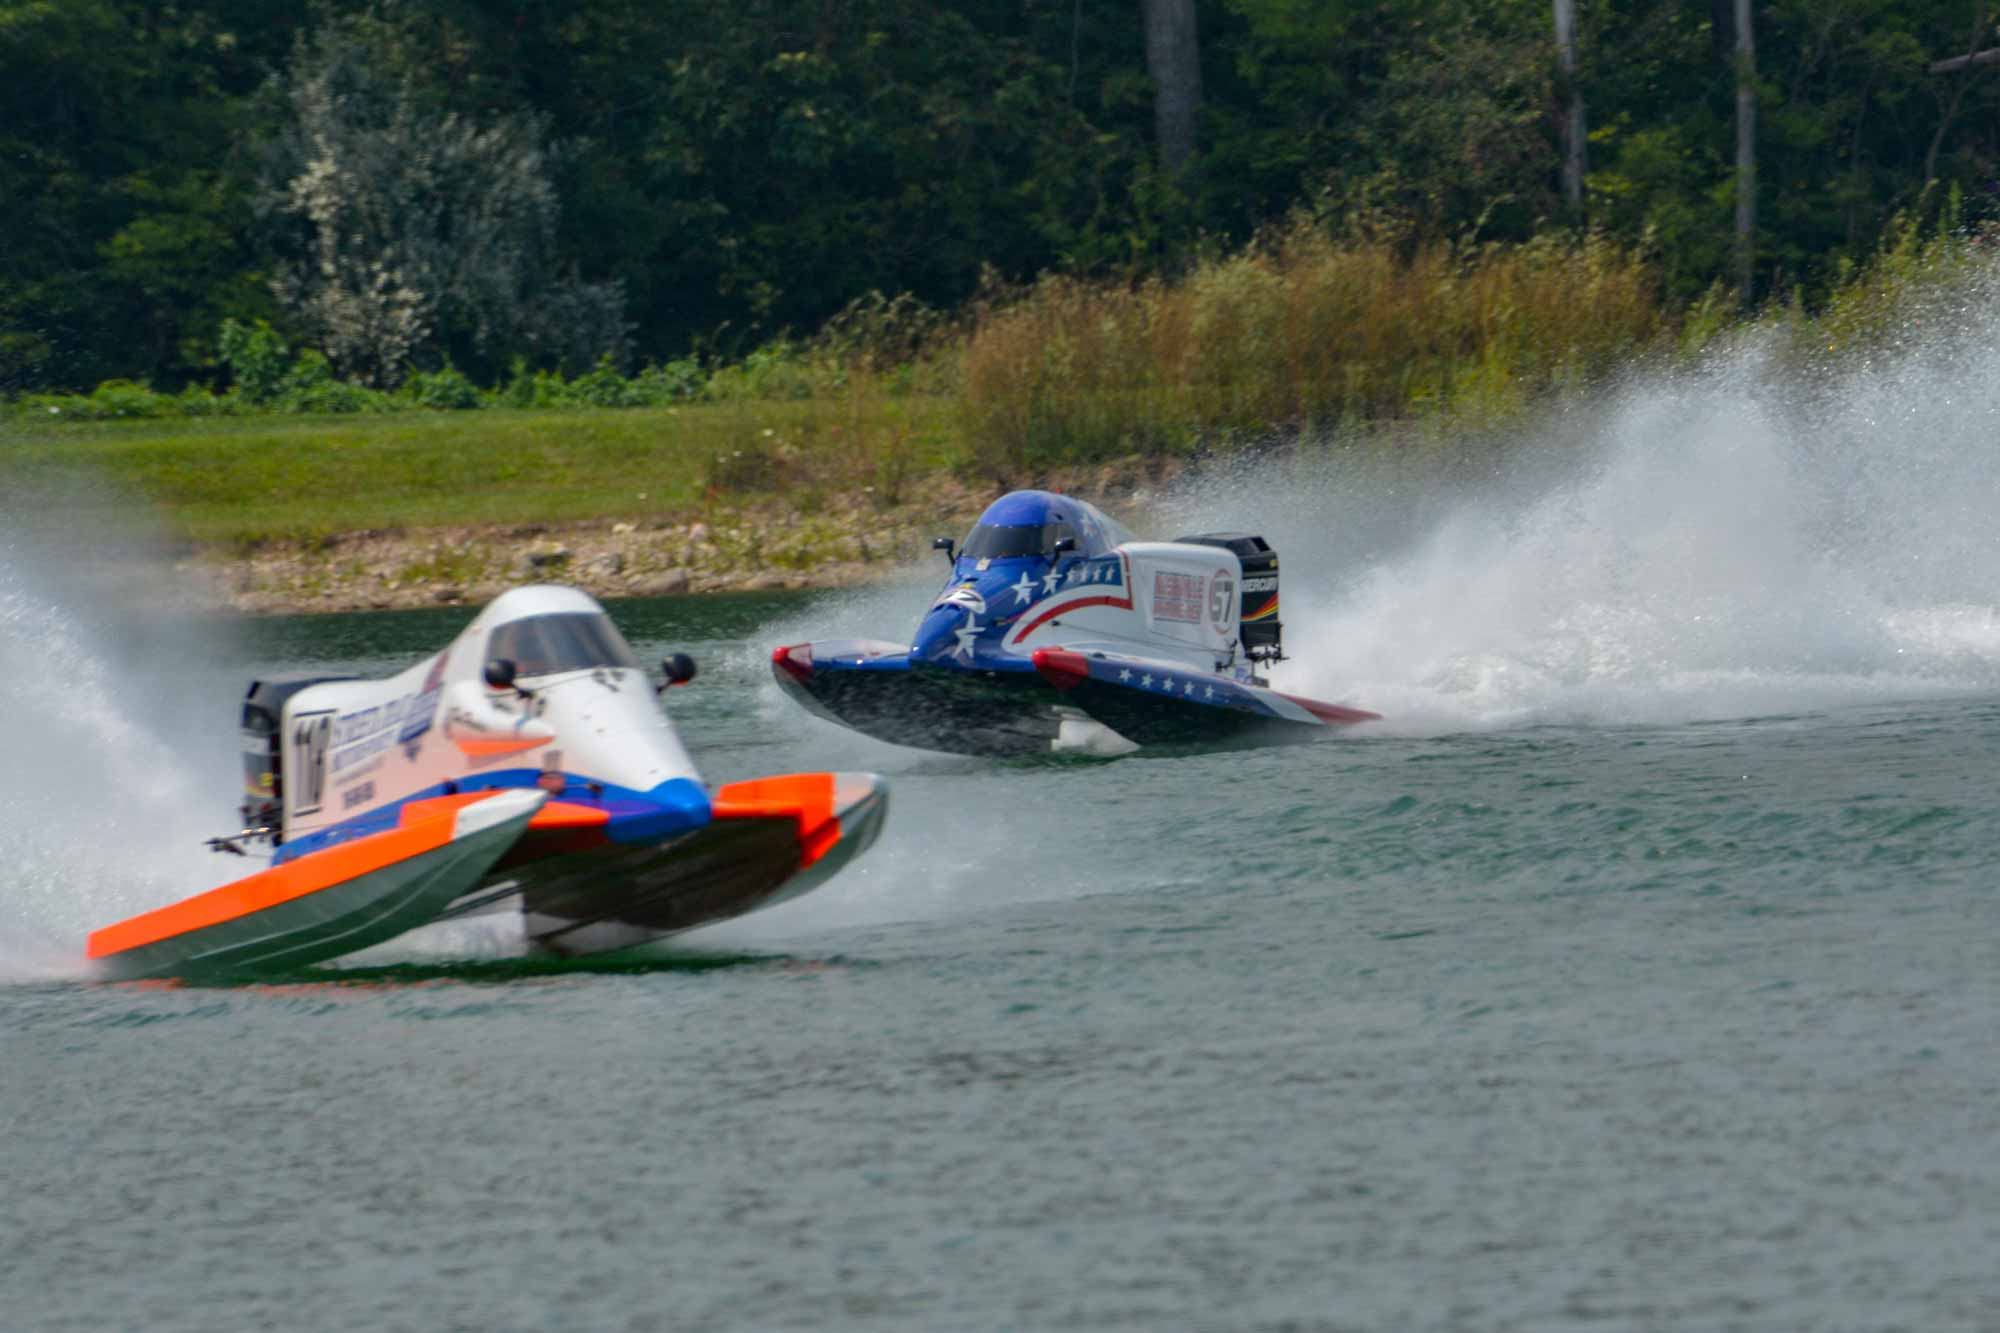 McMcMurray-Racing-Nashvill-Marine-2021-Springfield-F1-Race-5